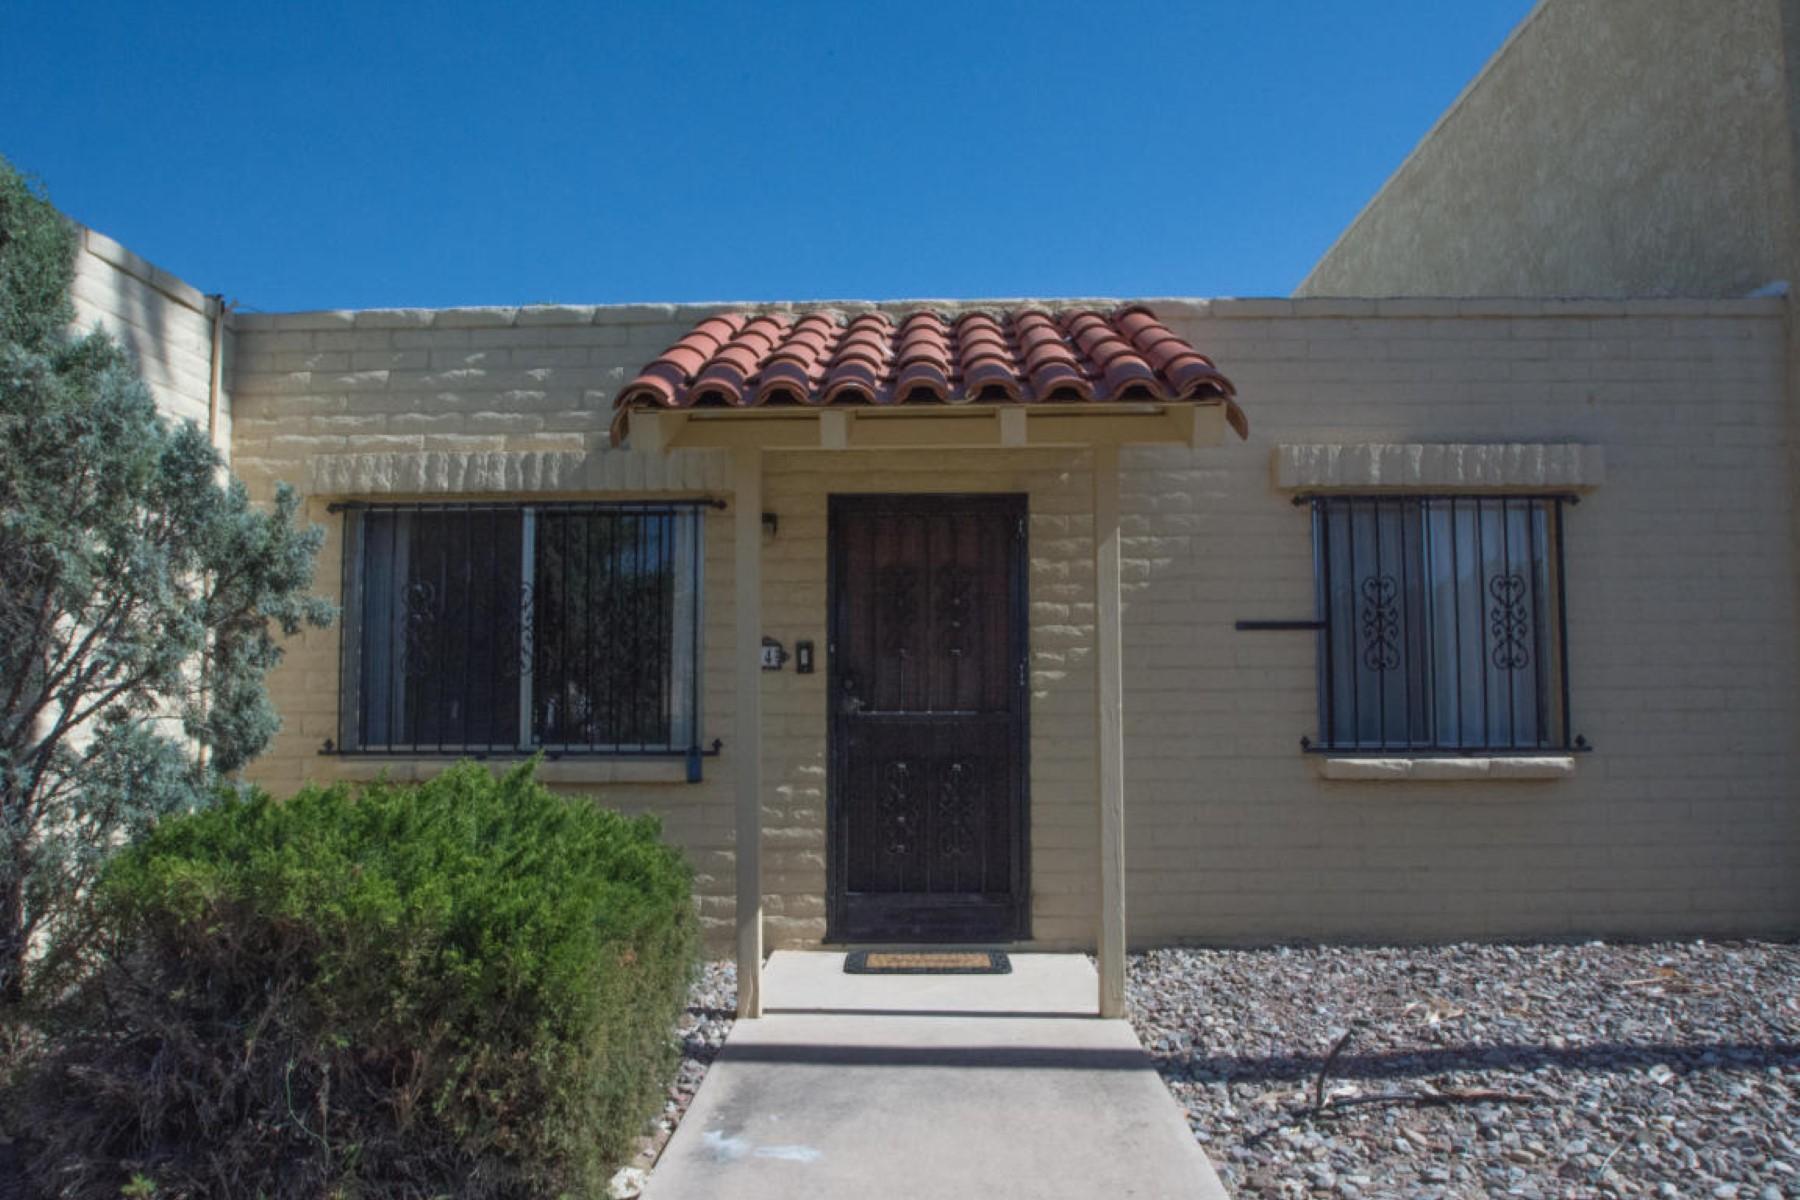 共管式独立产权公寓 为 销售 在 Well taken care condo for sale. 810 S Kolb Road 34 Tucson, 亚利桑那州 85710 美国